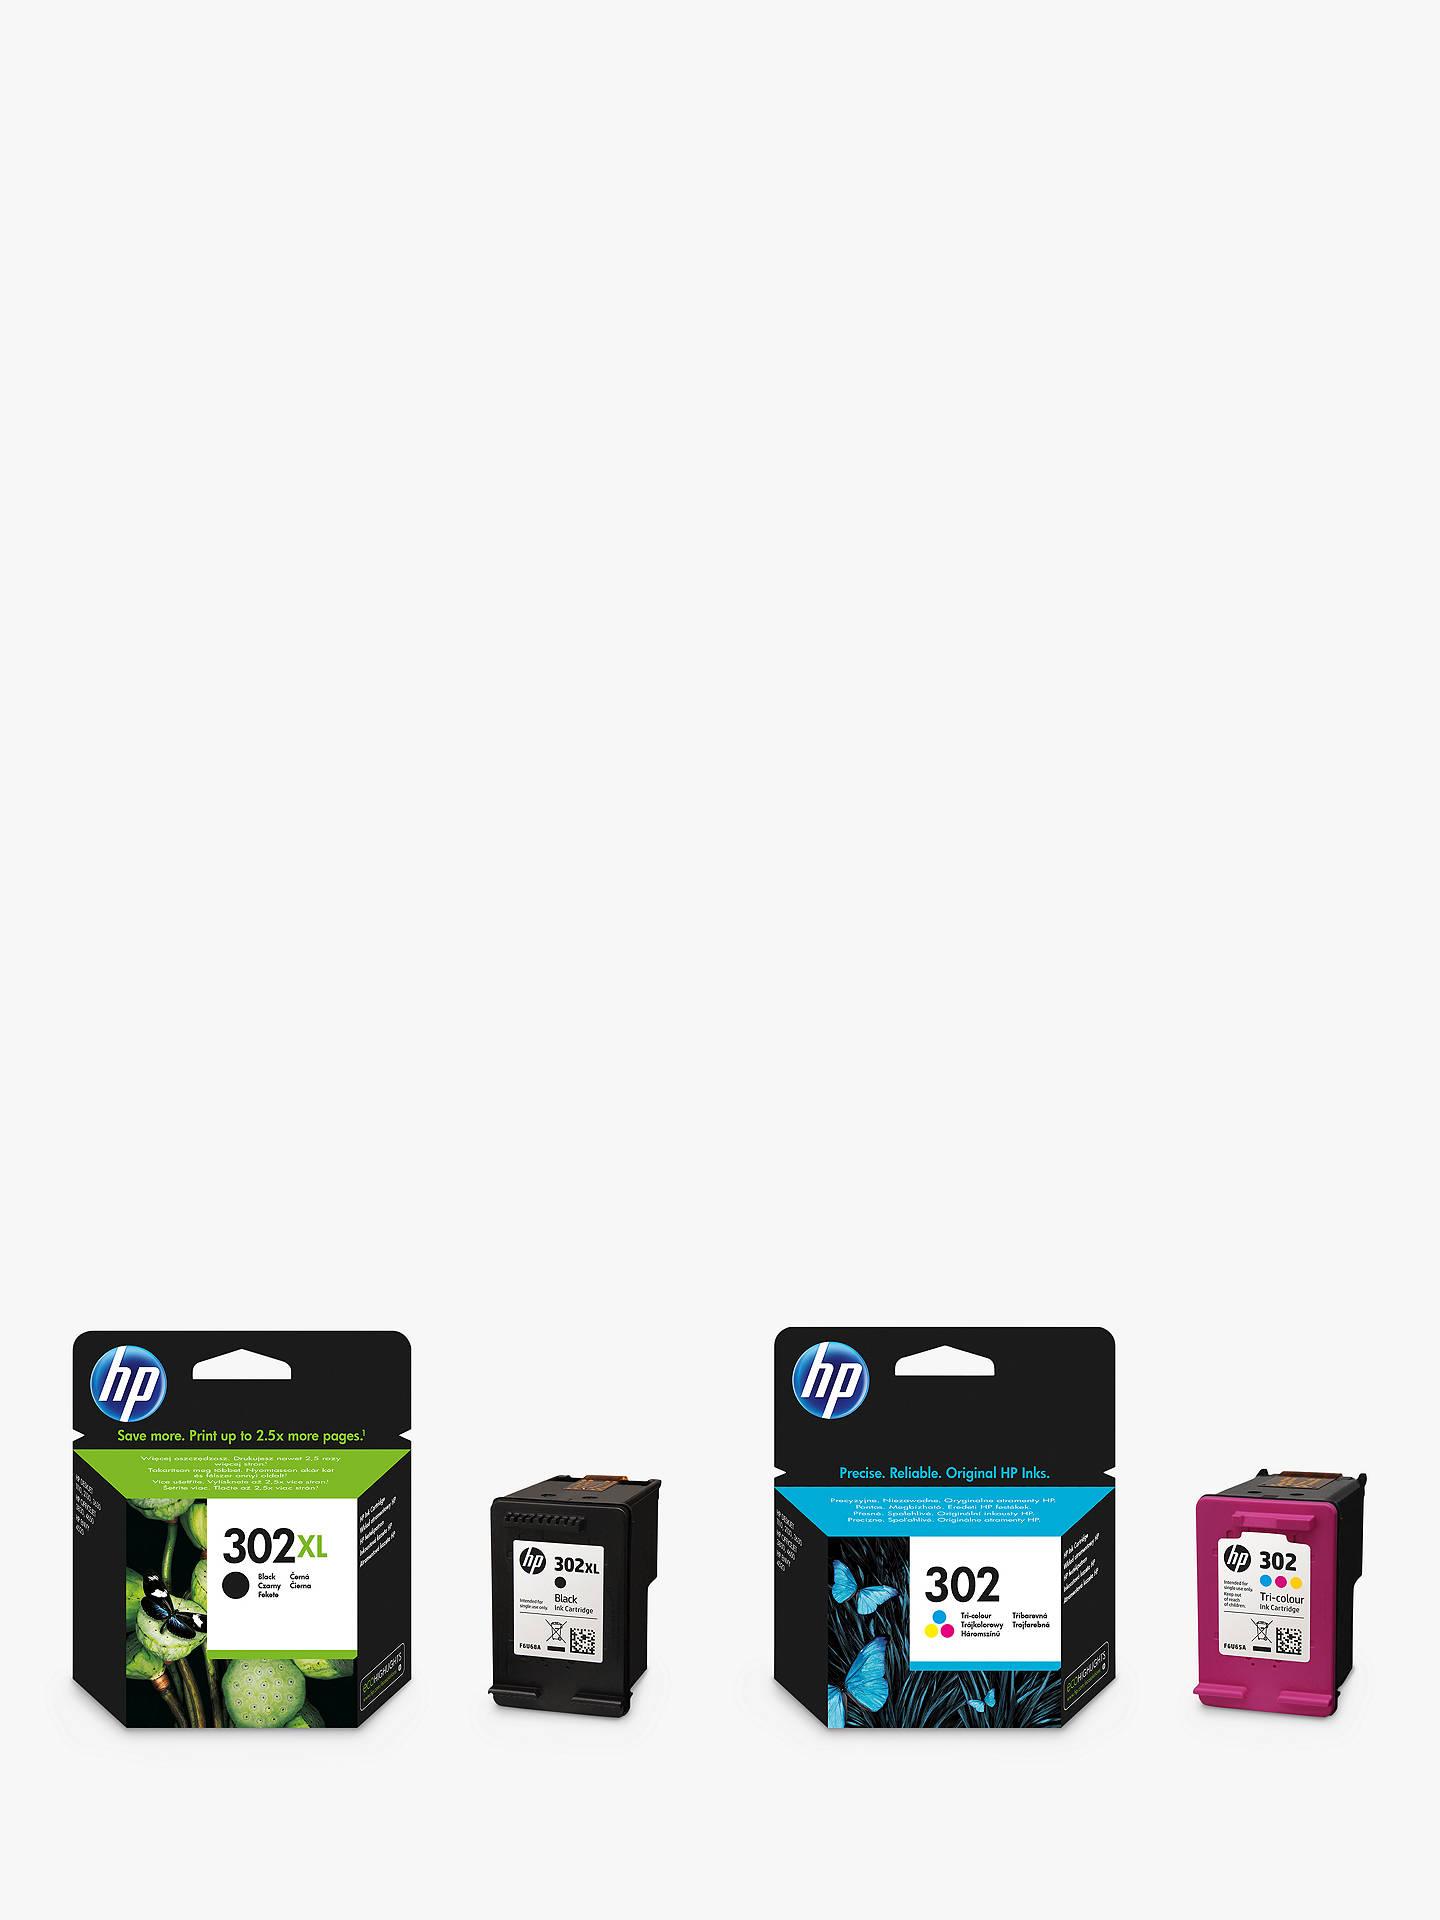 BuyHP 302XL Ink Cartridge Black 302 Tri Colour Multipack